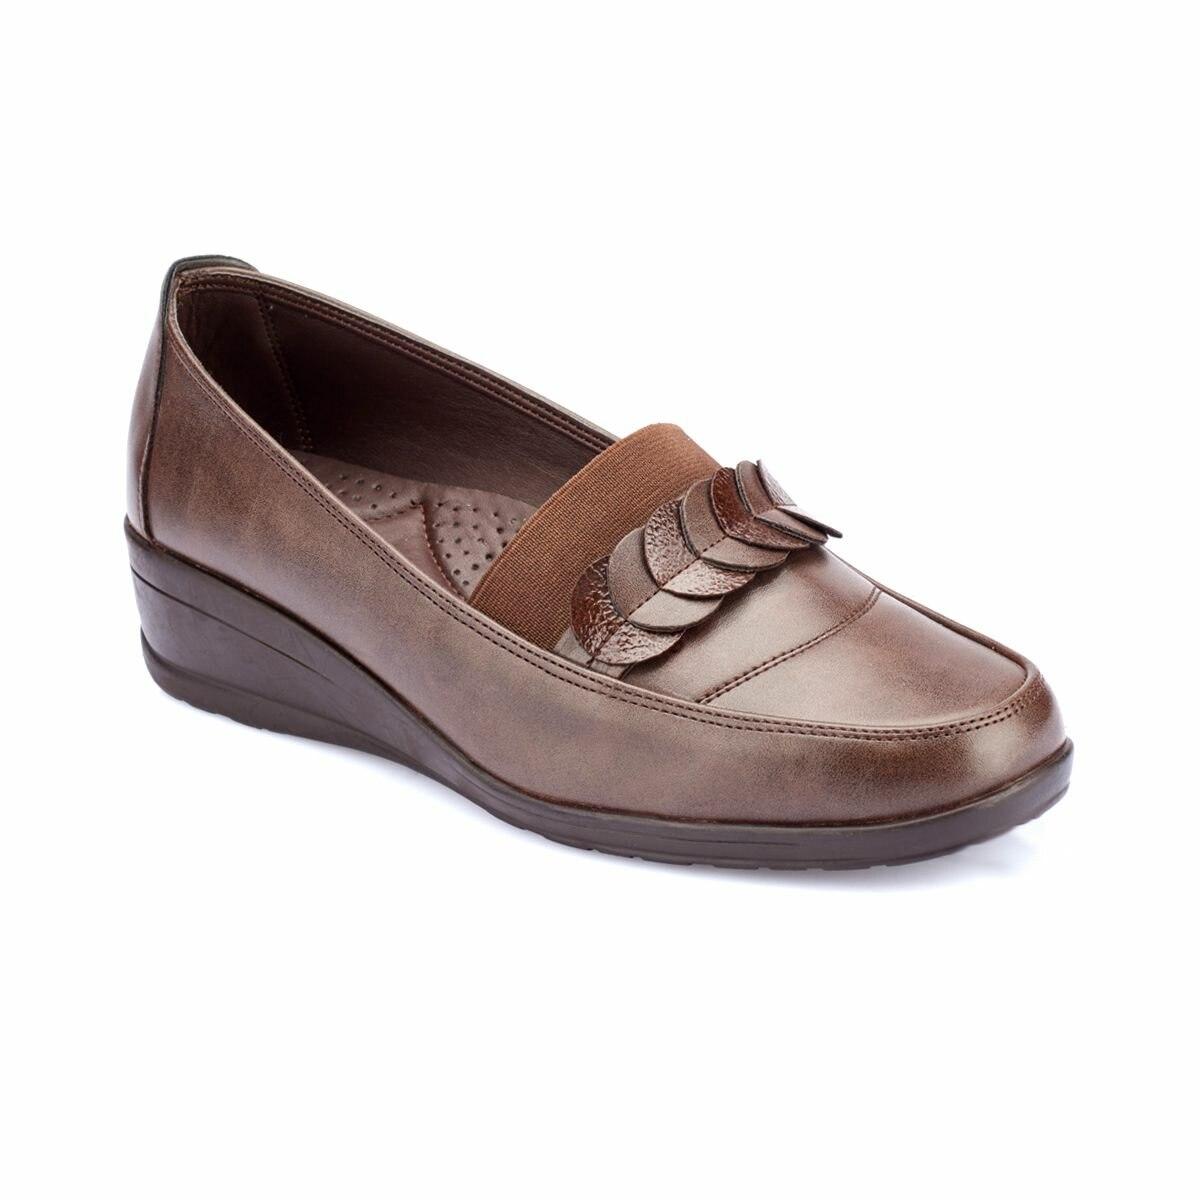 FLO 82. 150070.Z Brown Women 'S Shoes Polaris